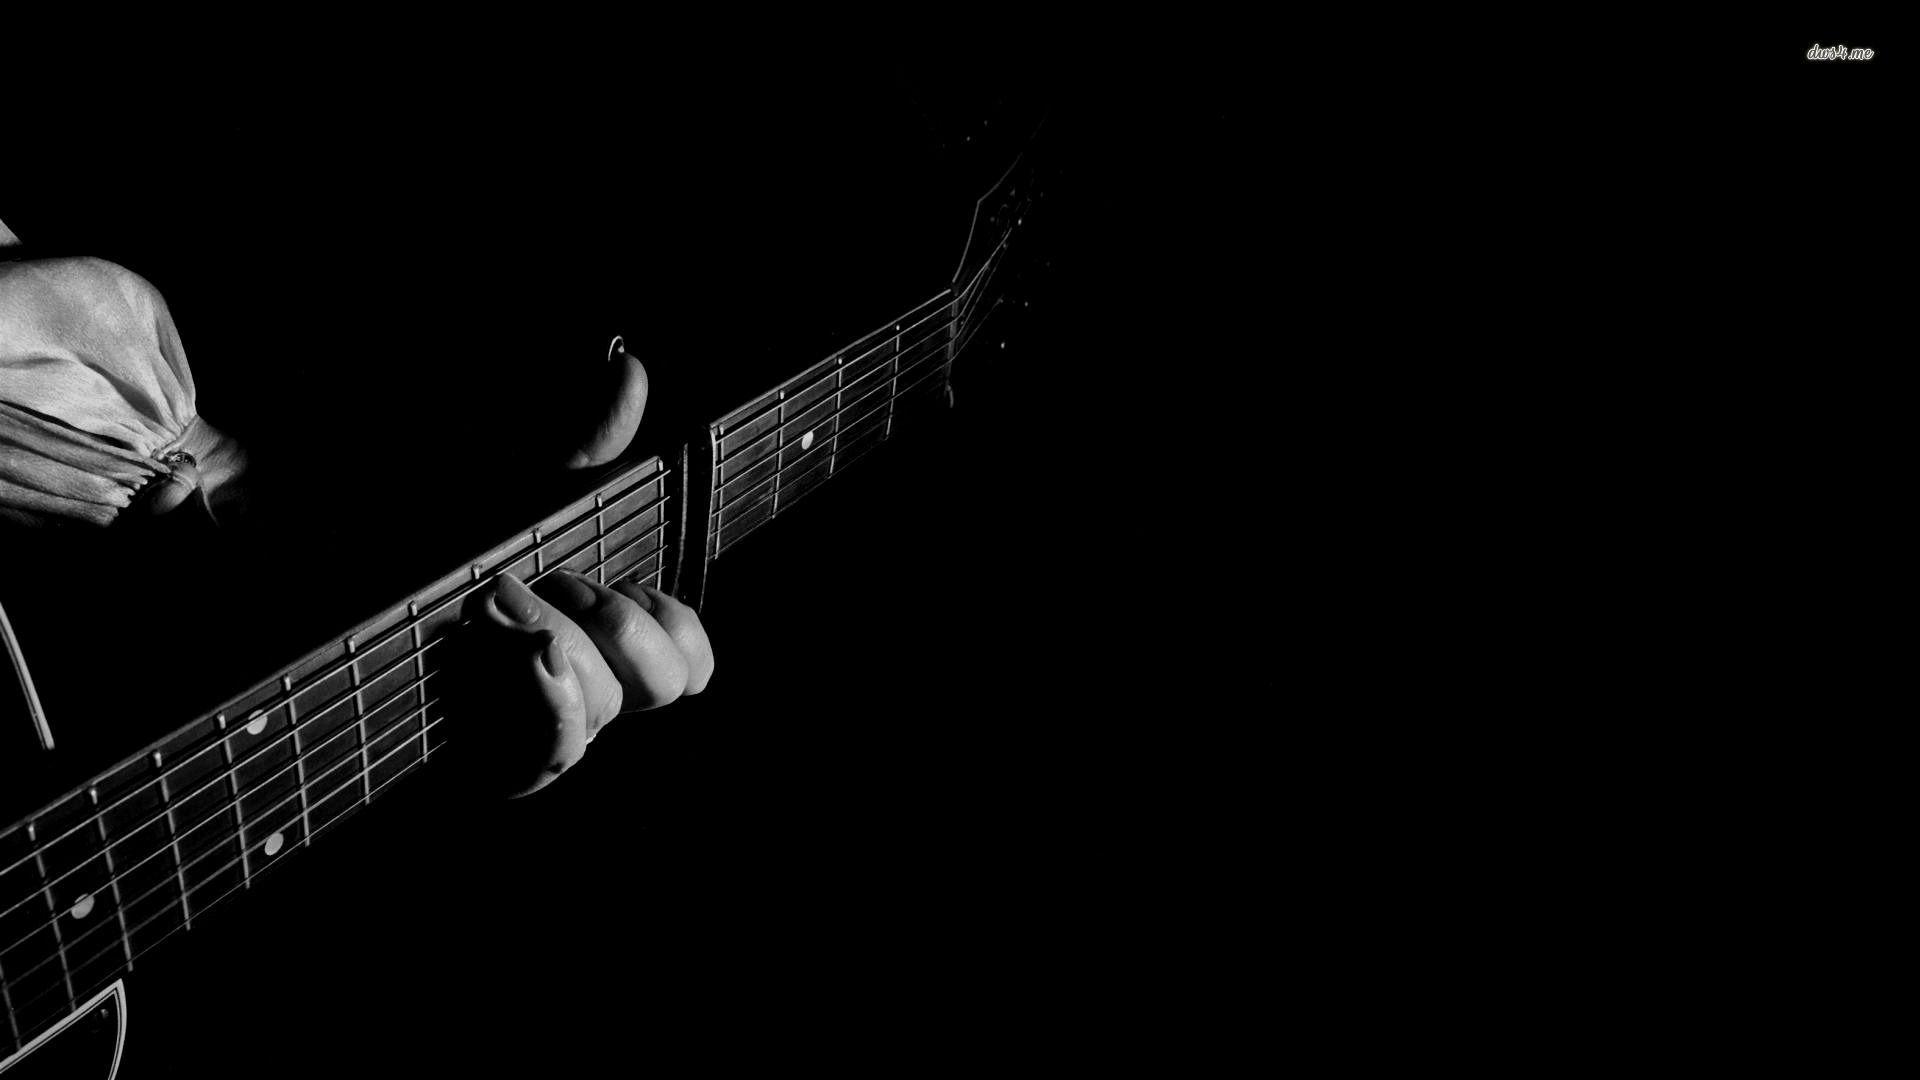 Radio Guitar Wallpapers Top Free Radio Guitar Backgrounds